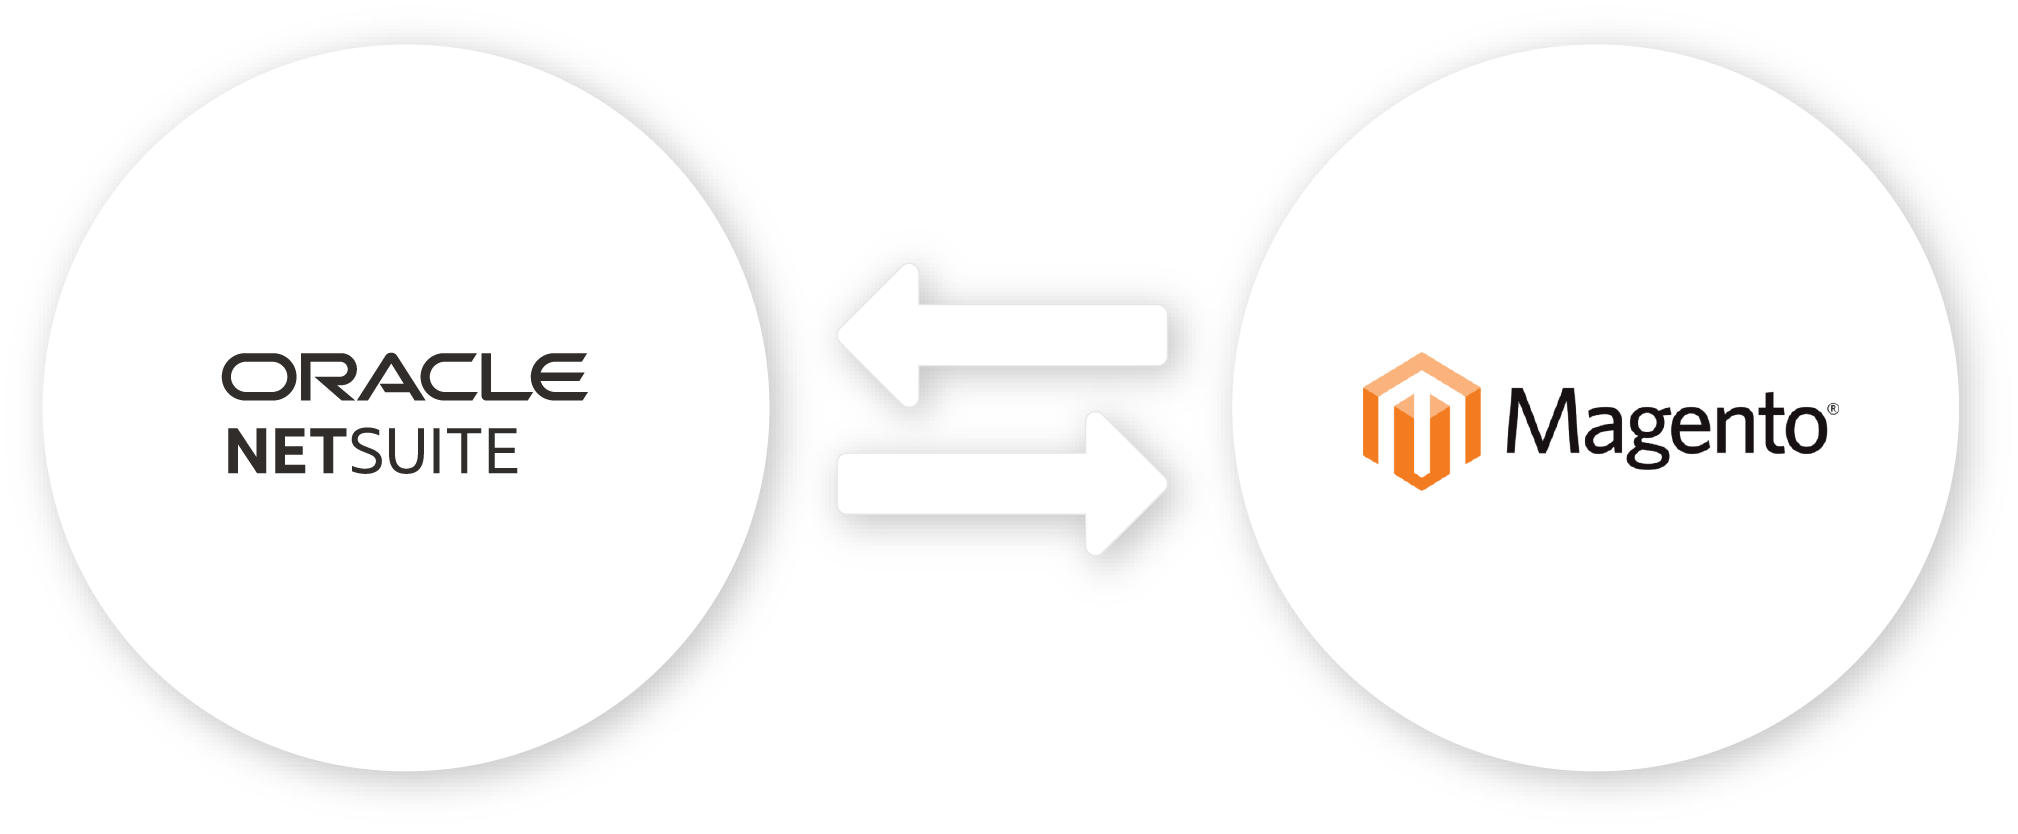 NetSuite to Magento